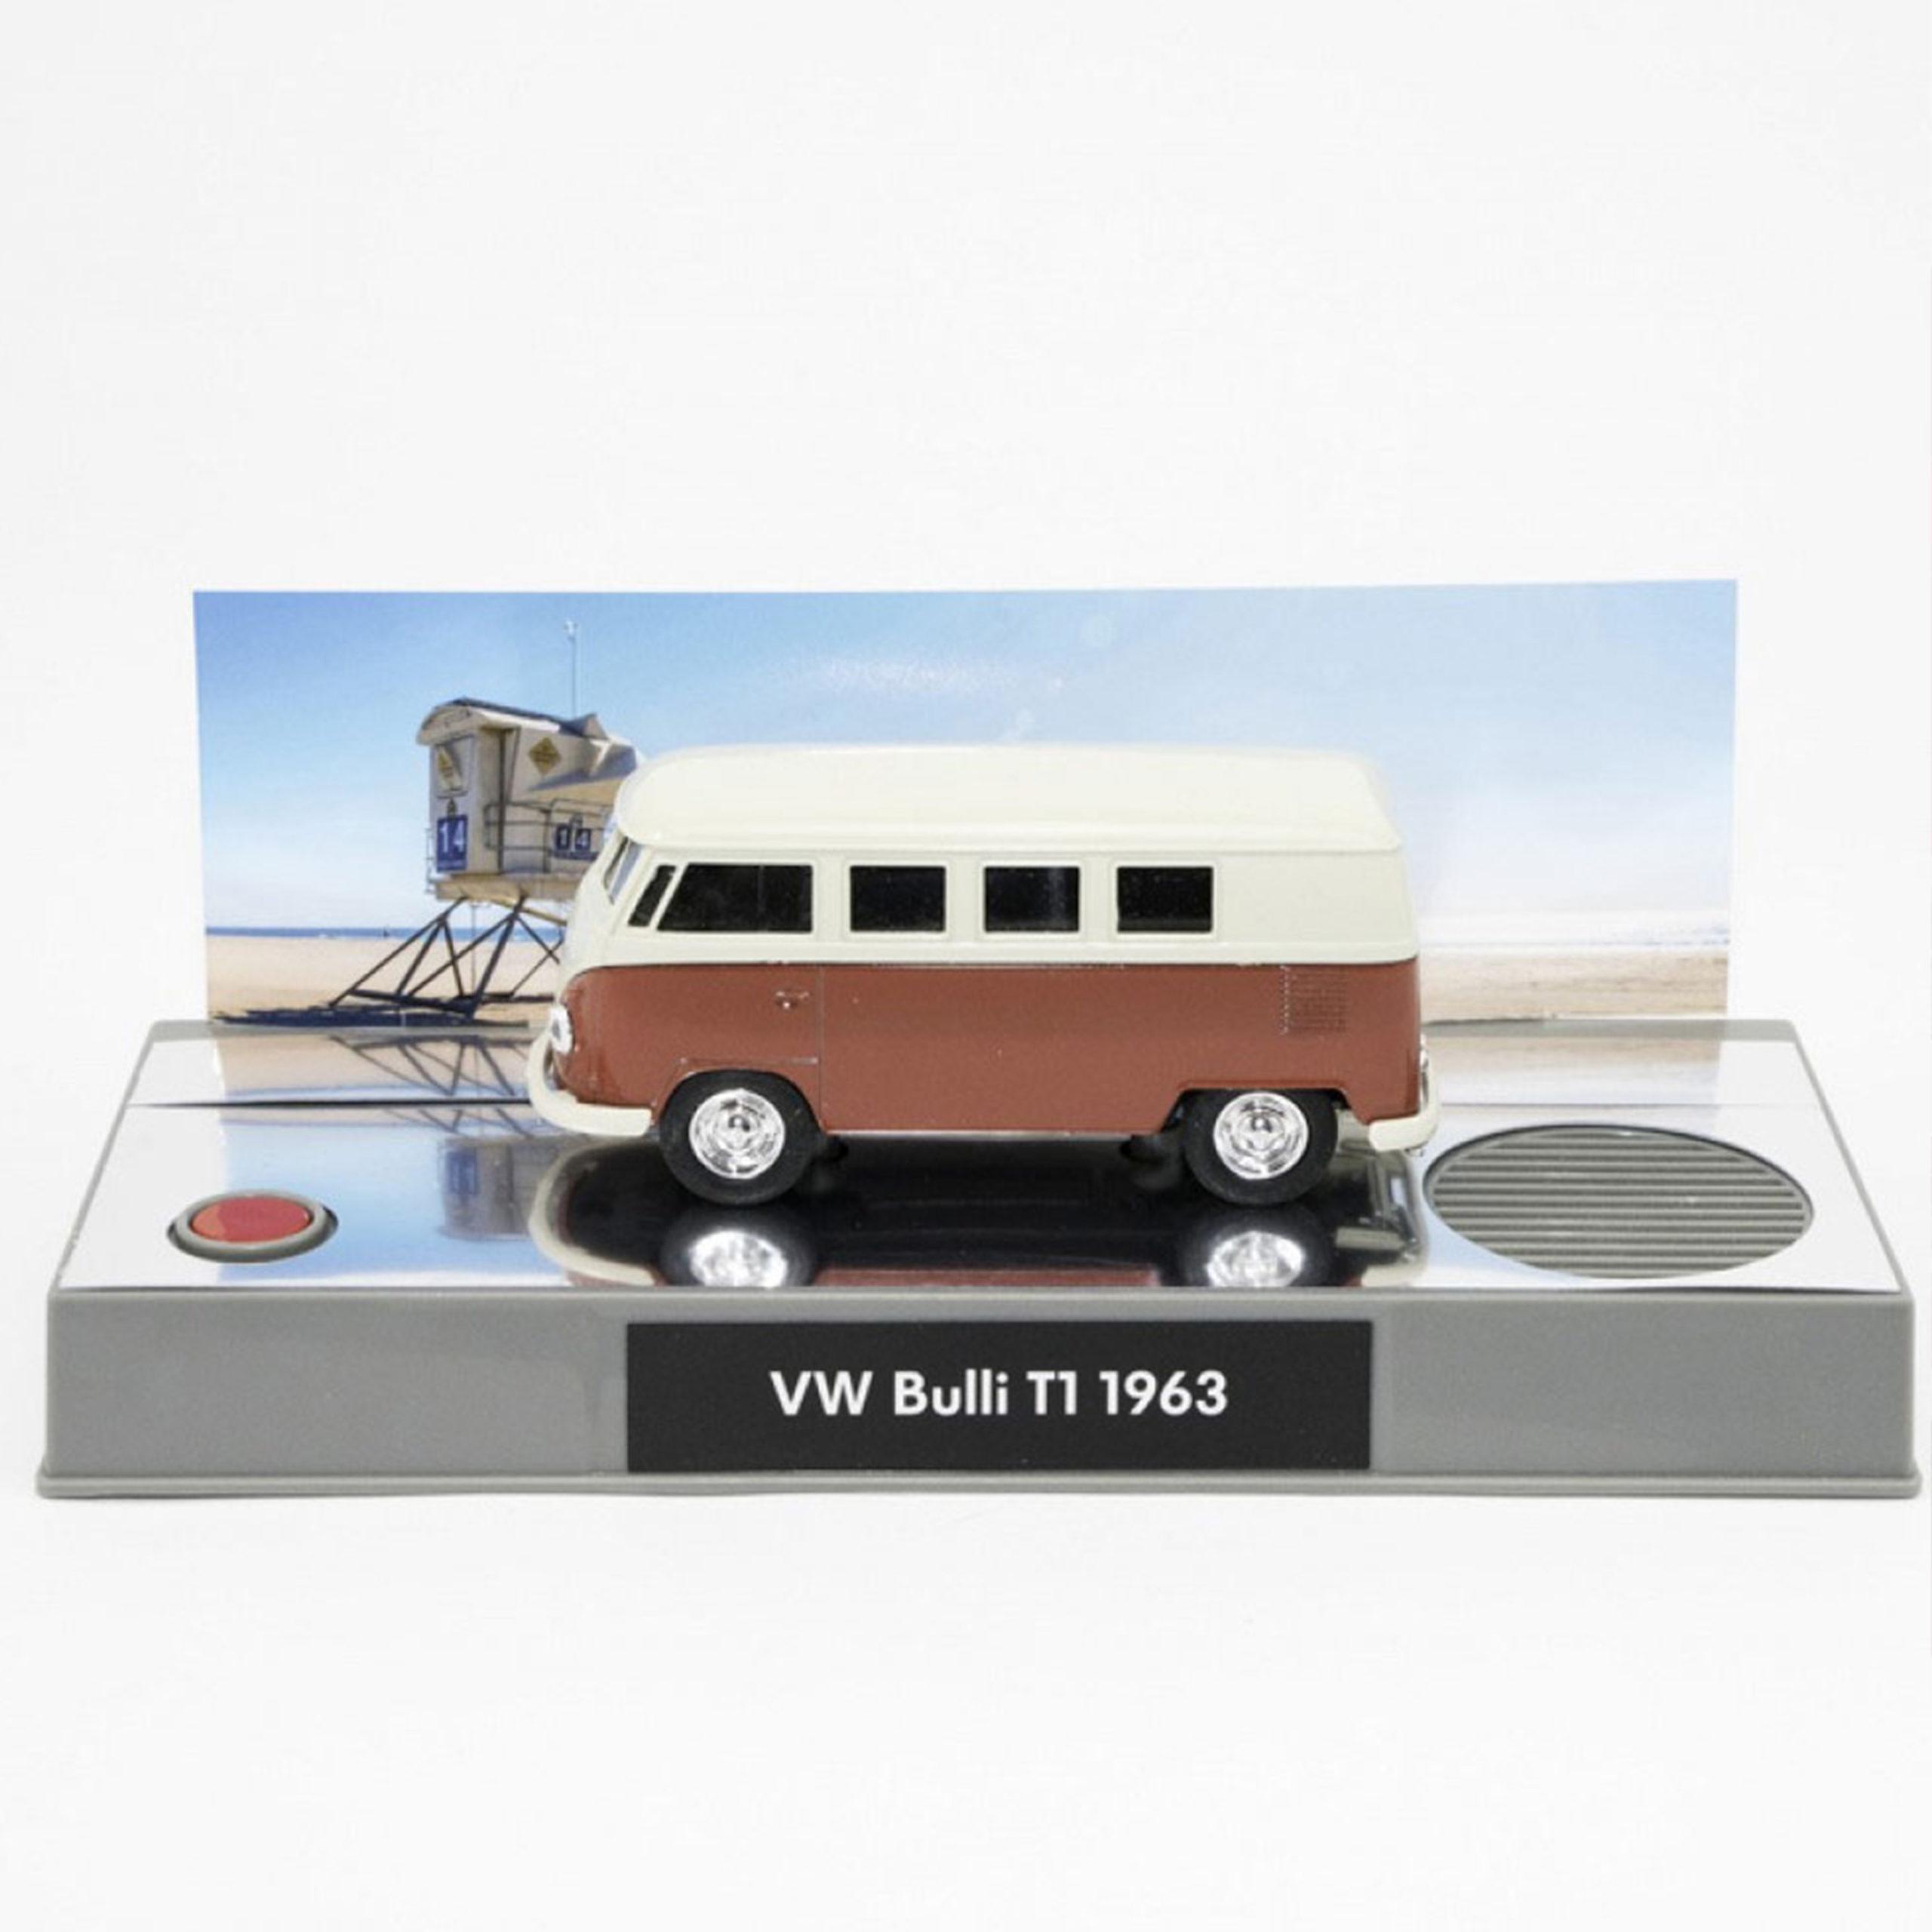 VW-Camper-van-from-advent-calendar